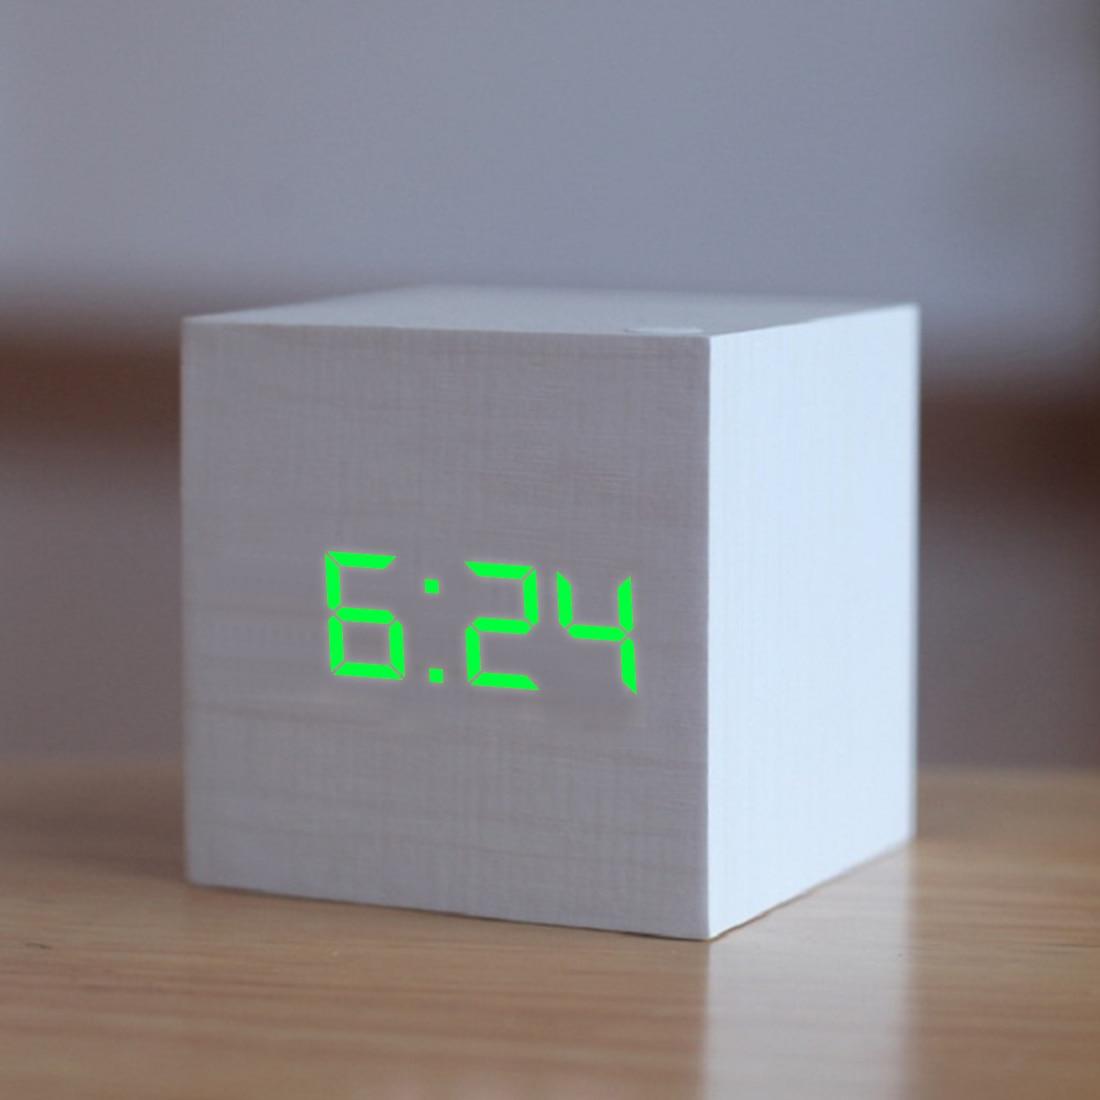 16 Choices Digital Wooden LED Alarm Clock Backlight Voice Control Wood  Retro Glow Clock Desktop Table Luminous Alarm Clocks